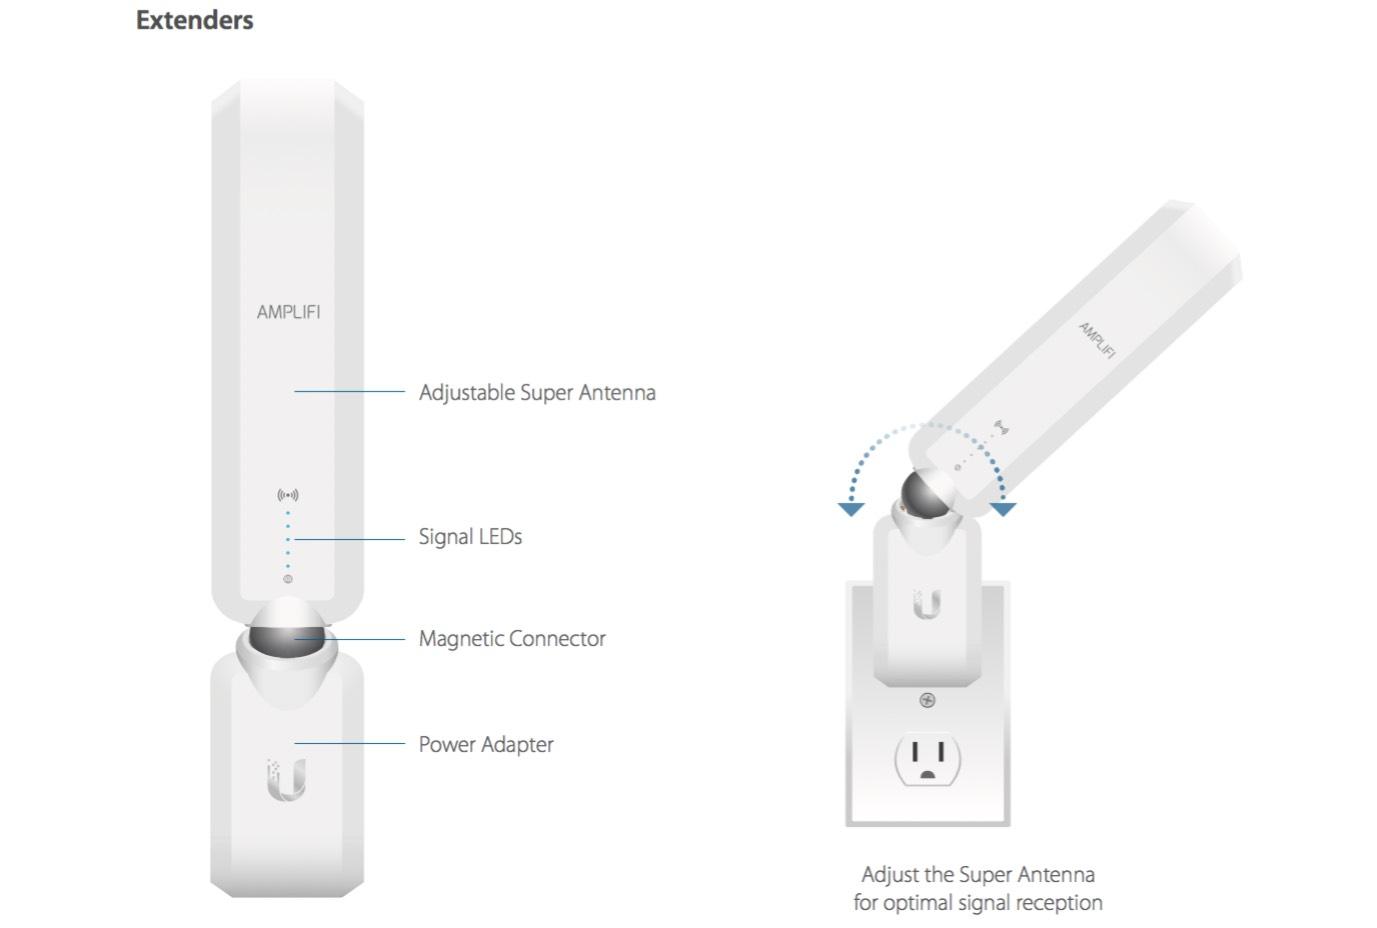 An adjustable Amplifi Wi-Fi extender.